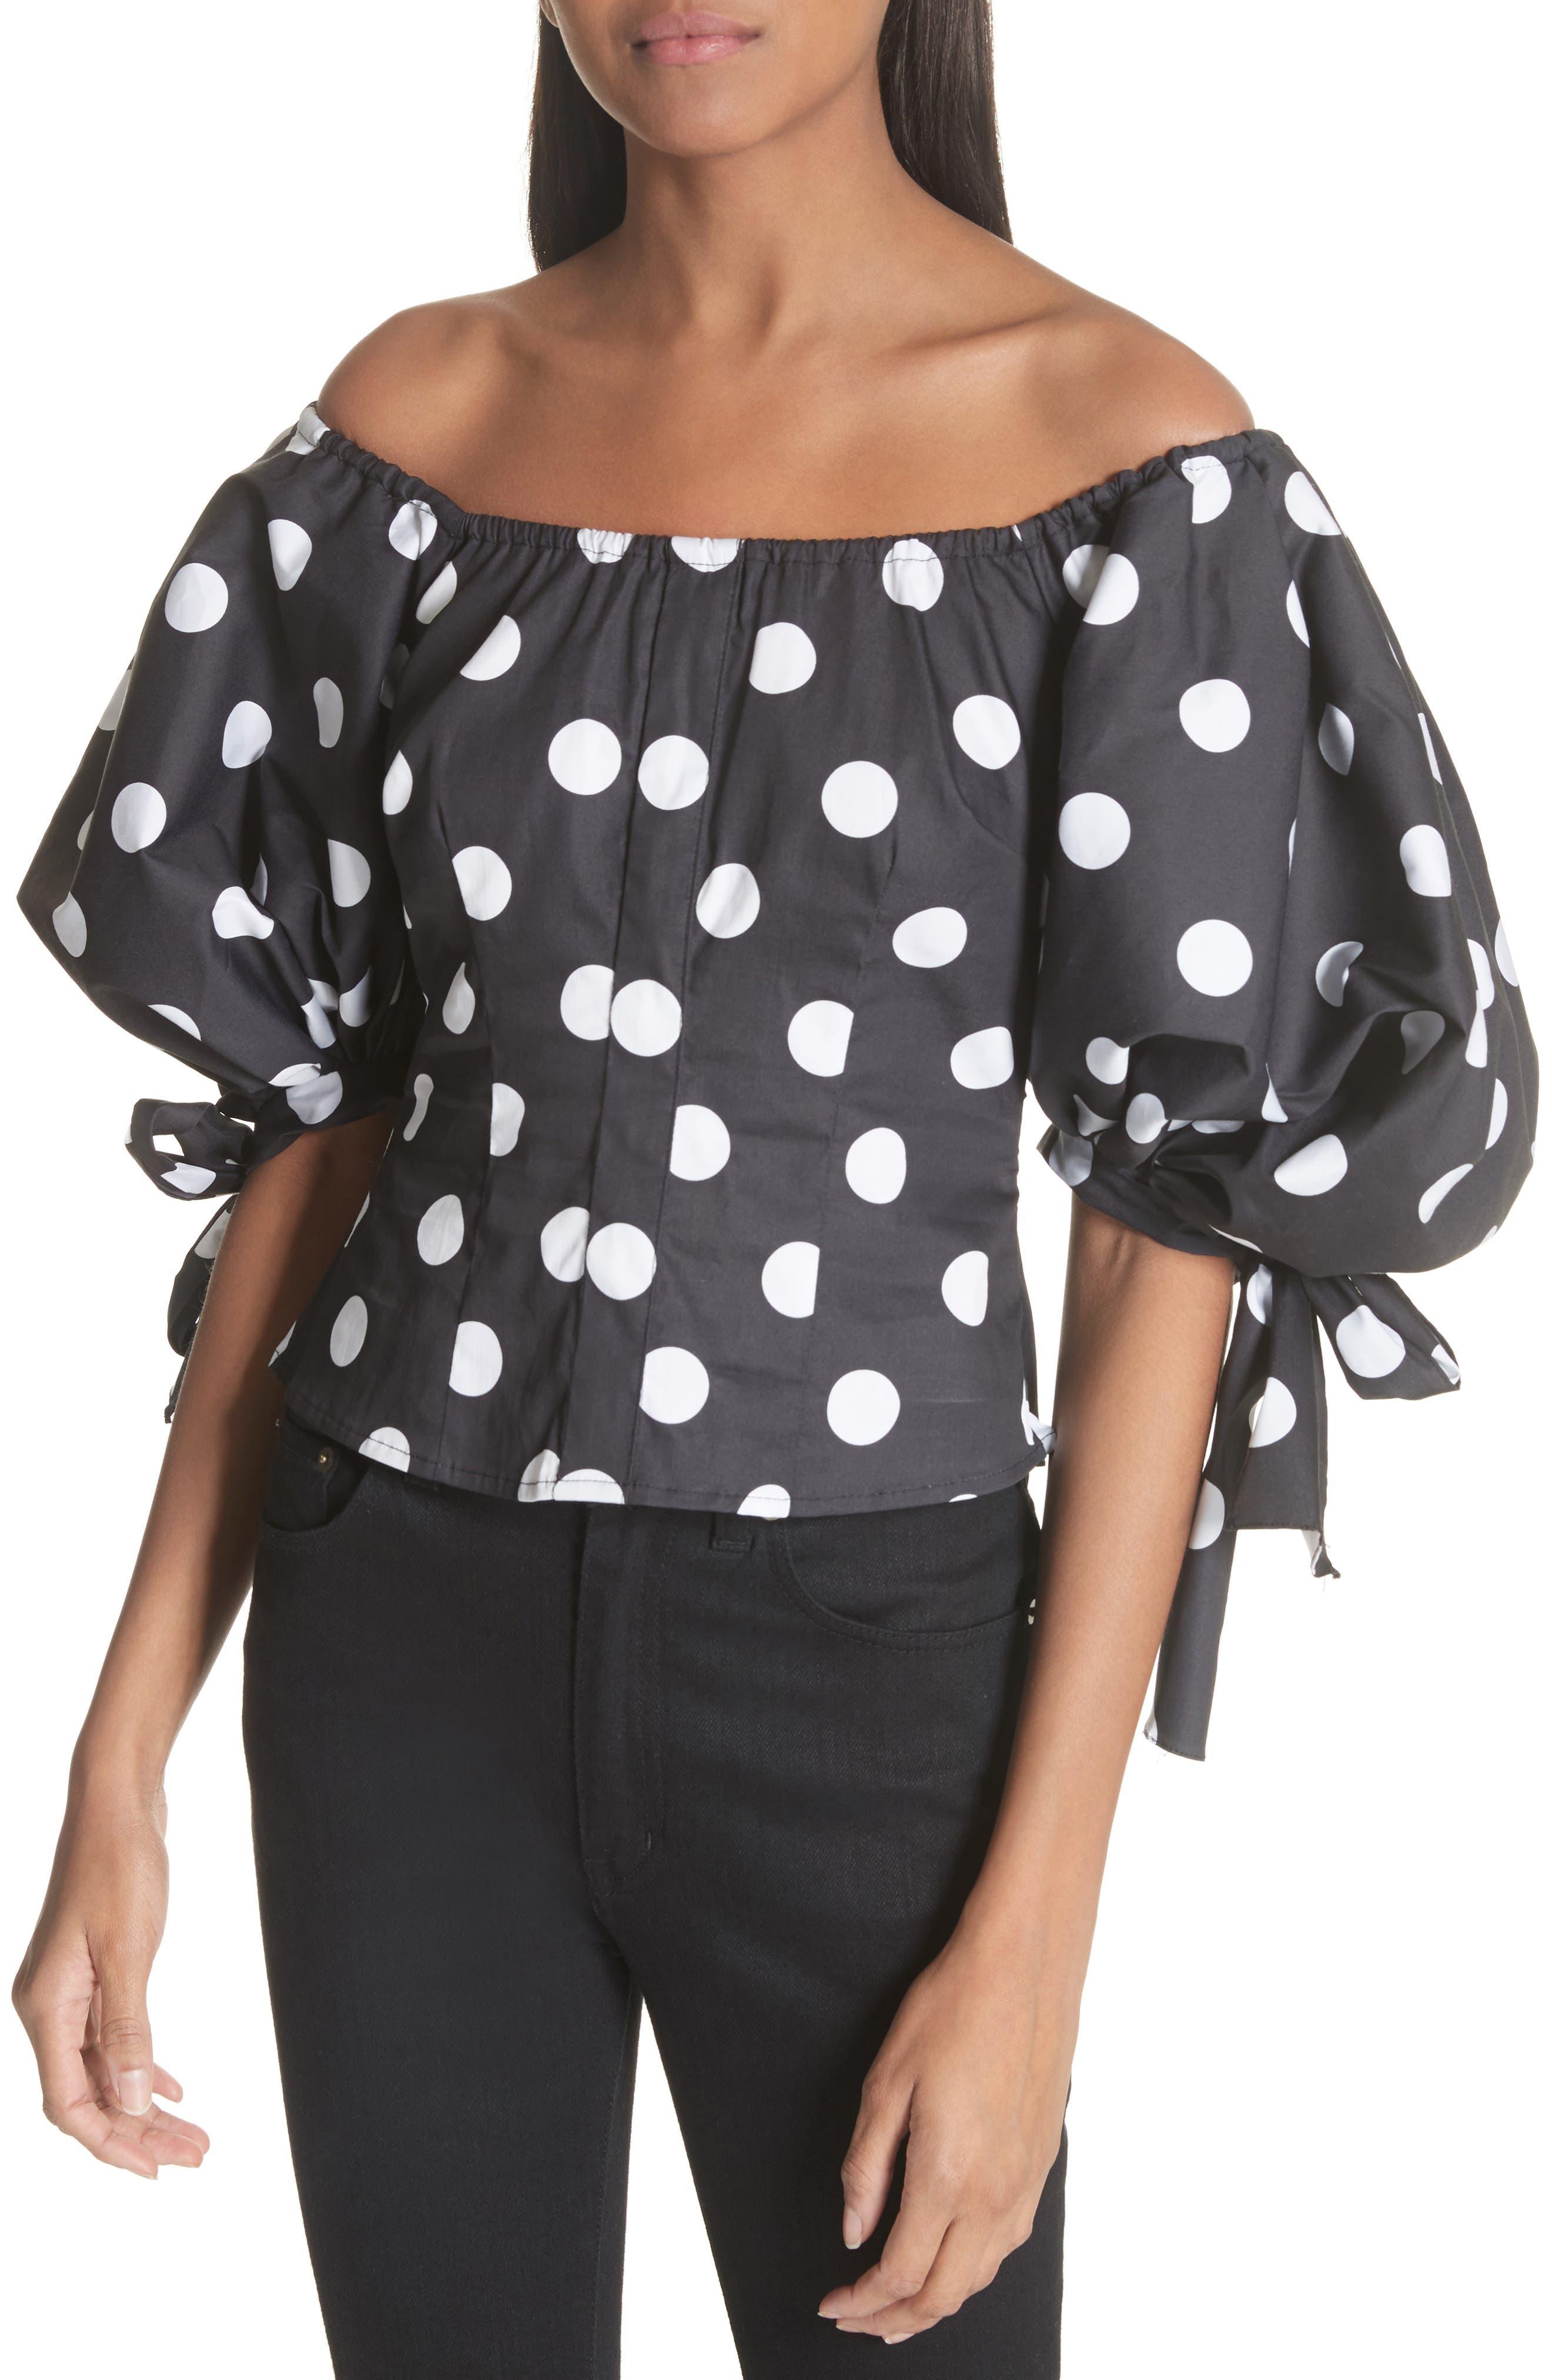 Nella Polka Dot Off the Shoulder Top,                         Main,                         color, Black/ White